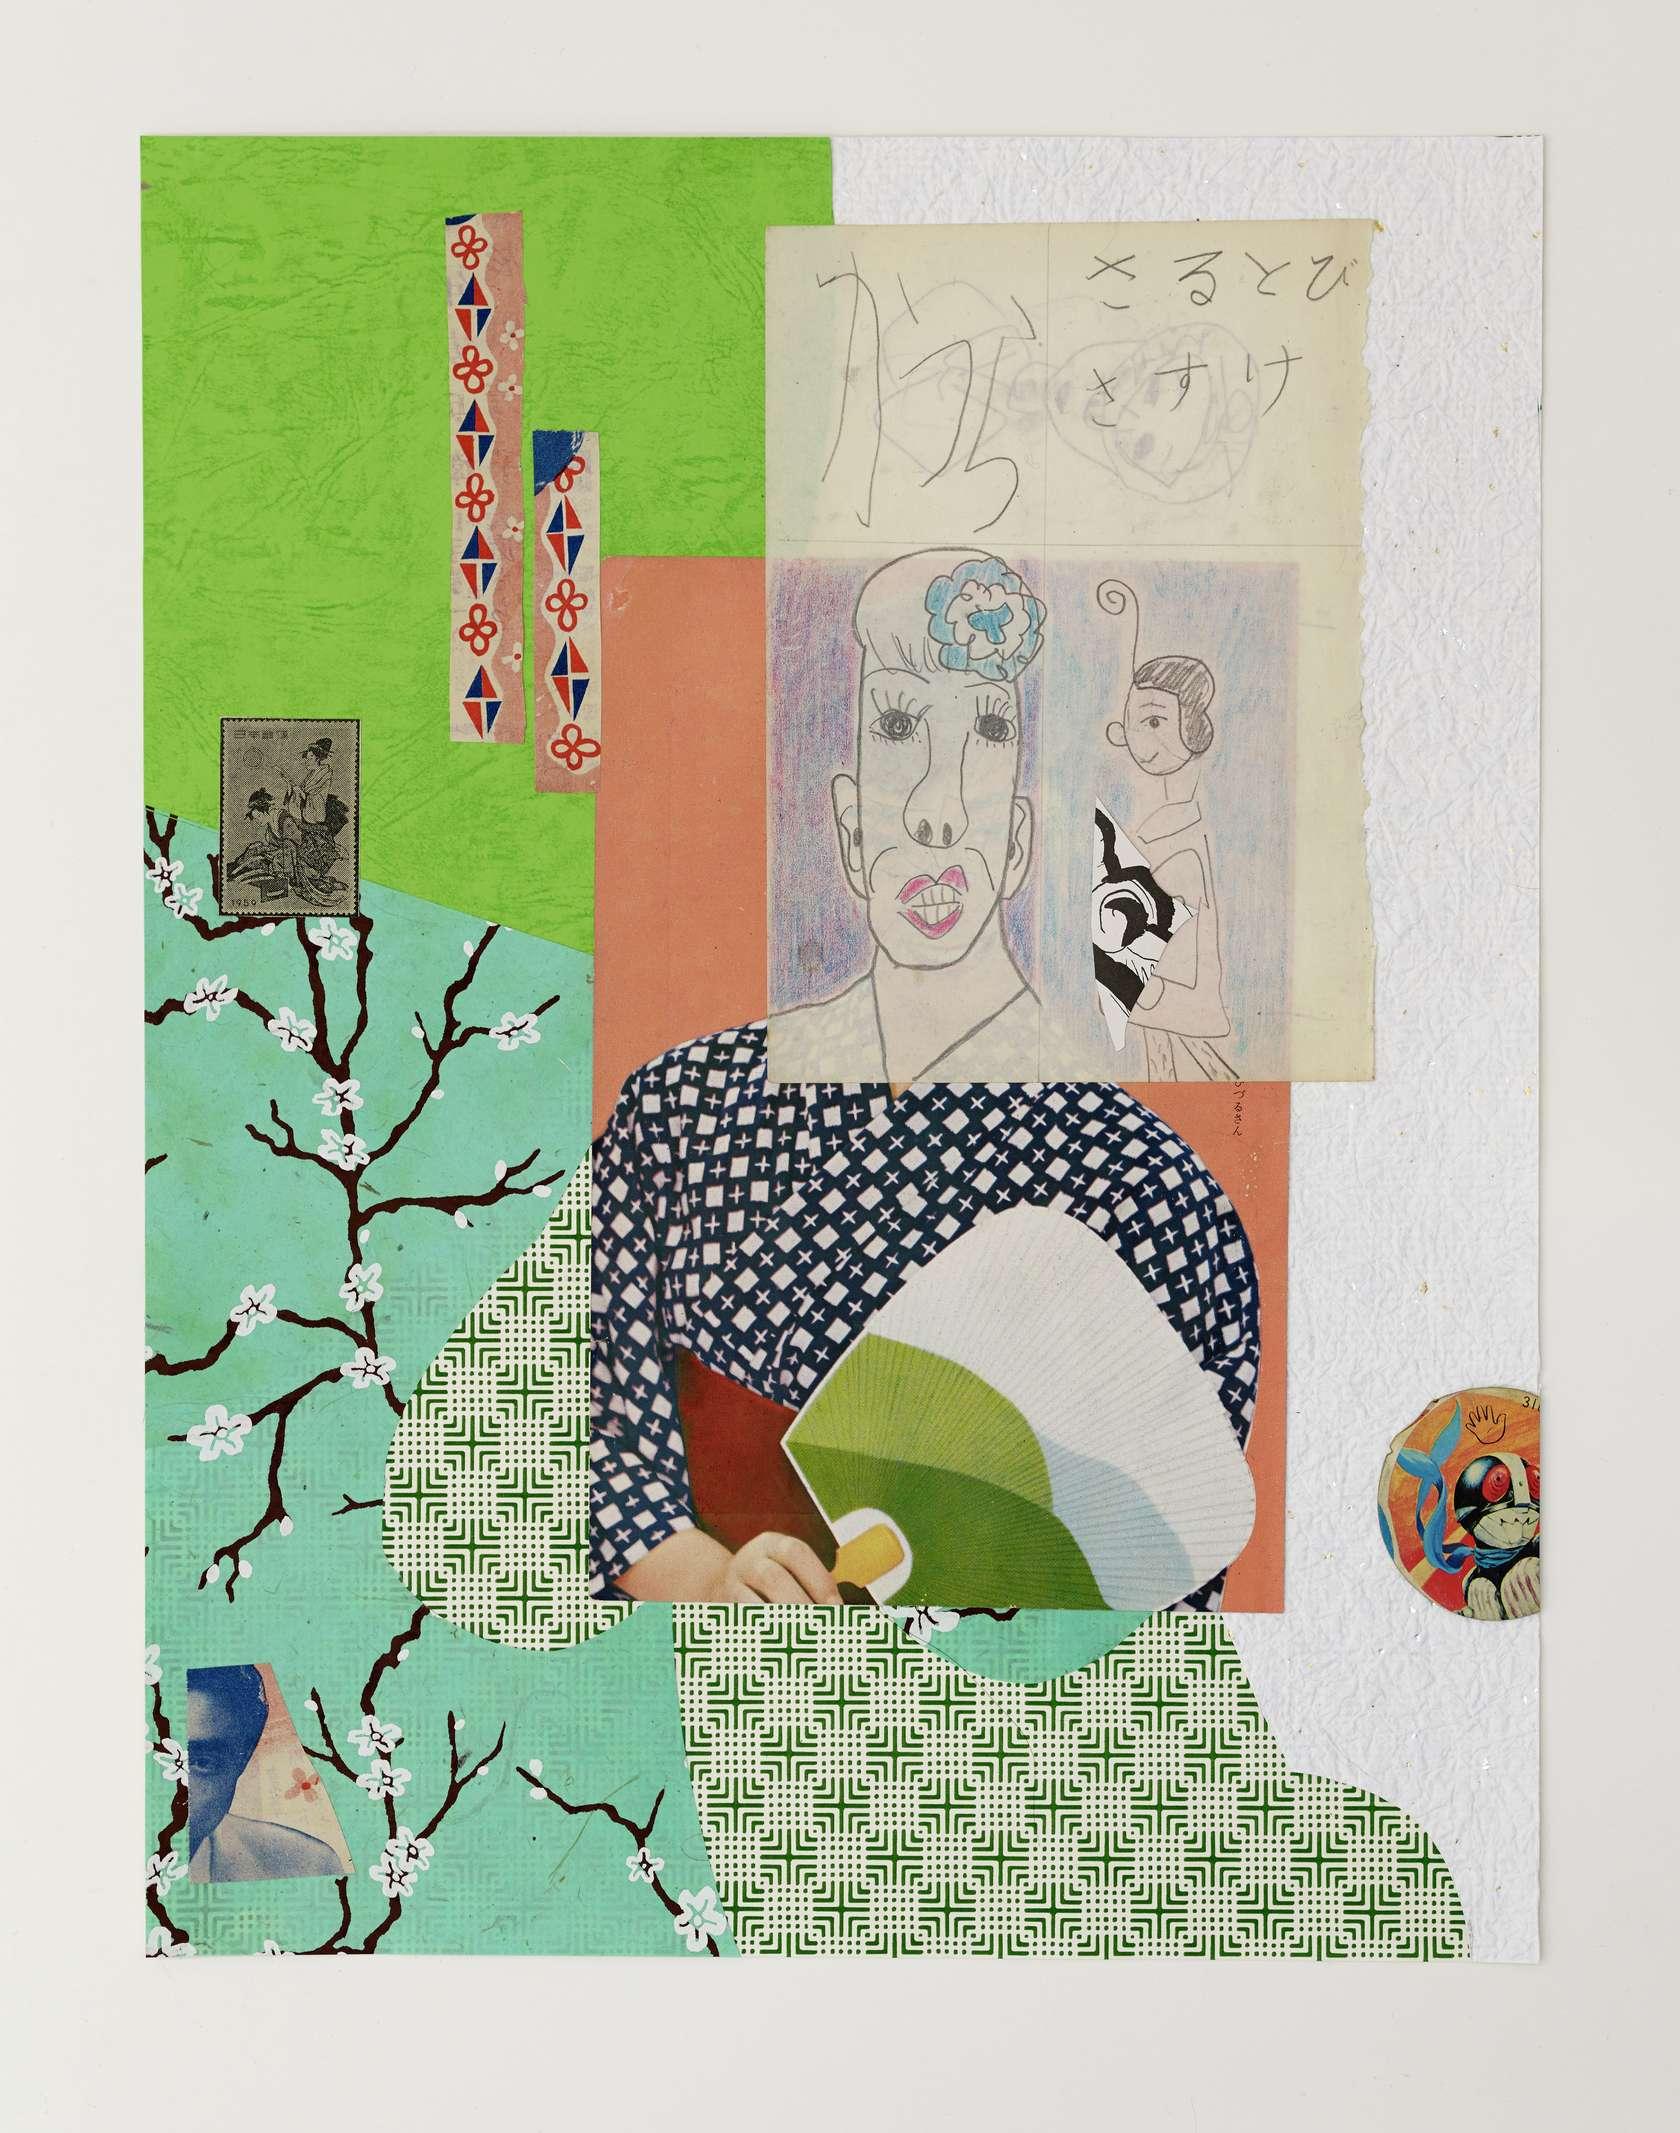 Hippolyte Hentgen, Sanjo Dori, 2019 Collage sur papier44 × 34 cm / 17 3/8 × 13 3/8 in.